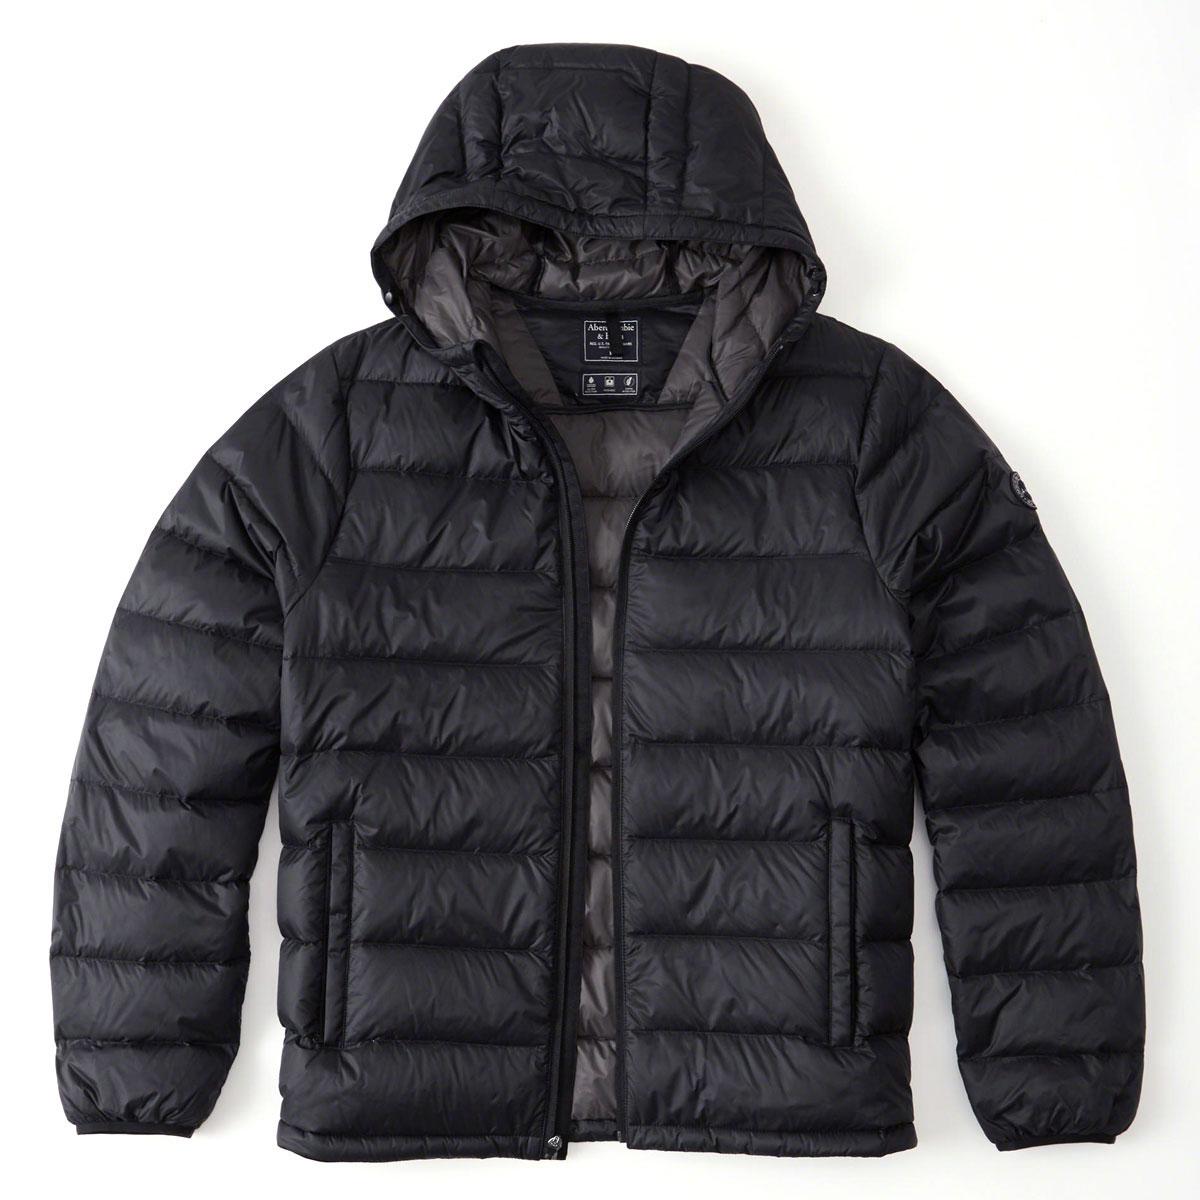 121cf5488 ABBA black outer men's regular article Abercrombie & Fitch jacket down  jacket LIGHTWEIGHT HOODED PUFFER JACKET 132-328-1245-200